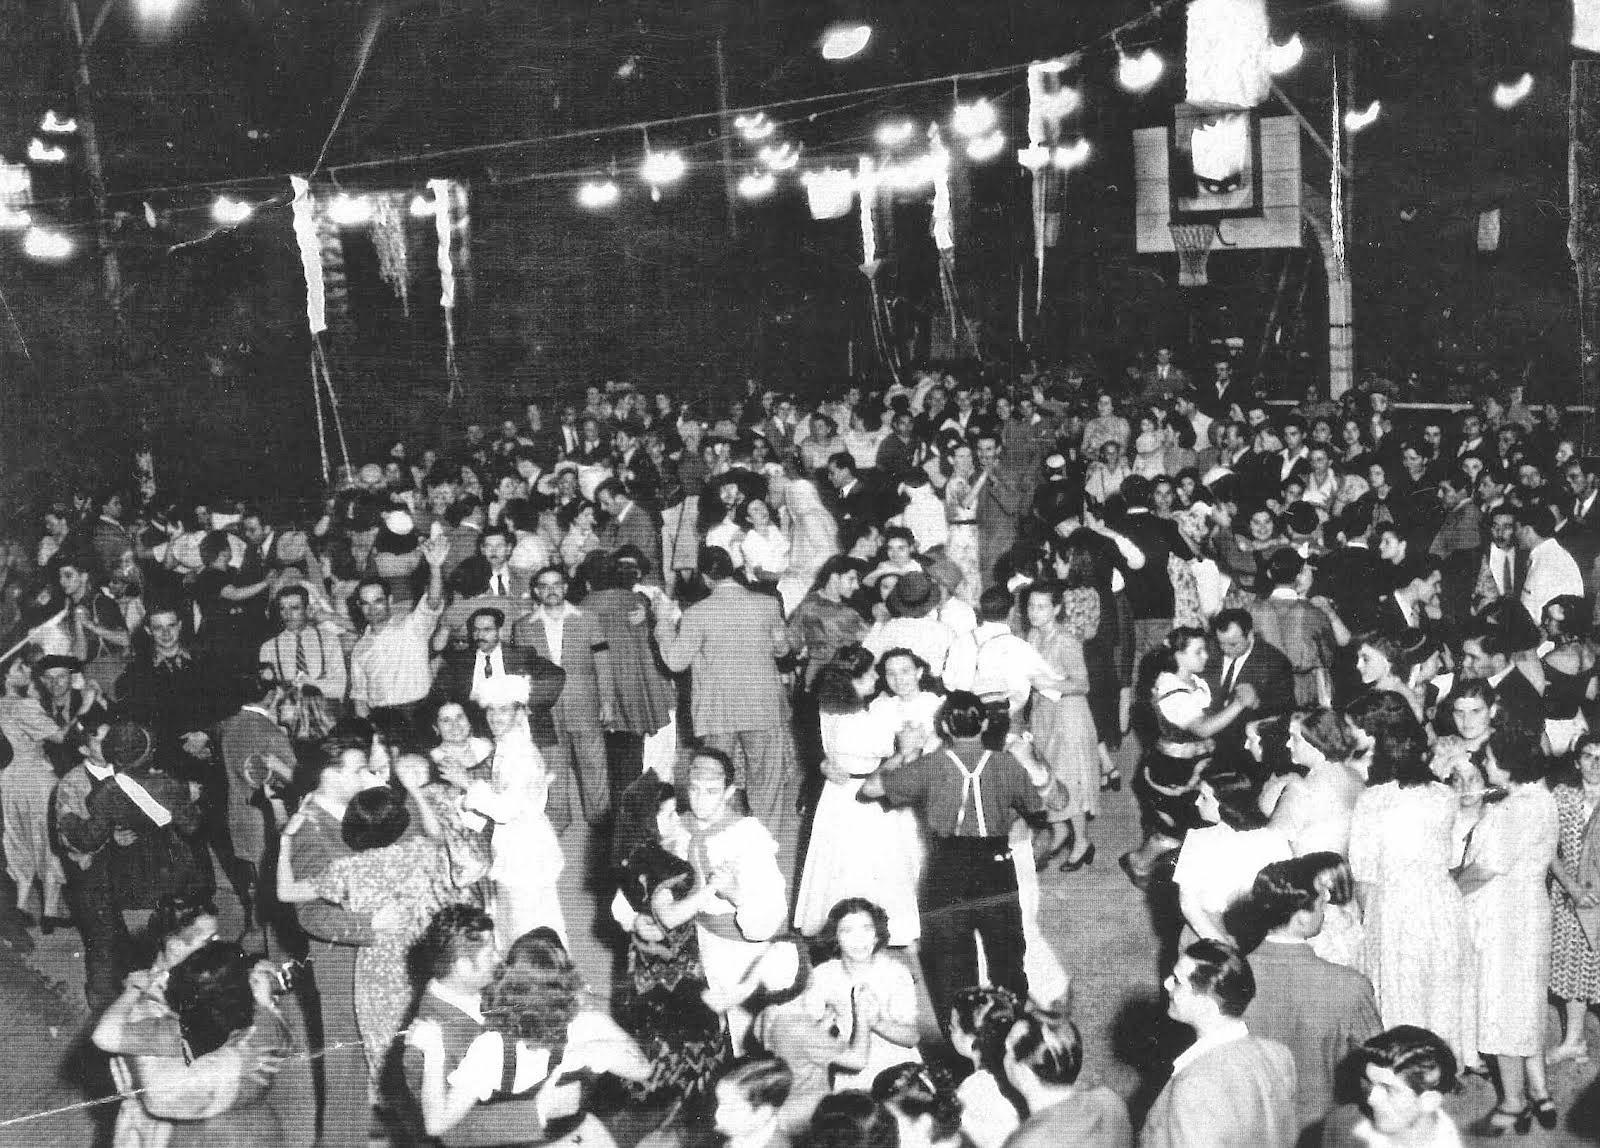 Carnaval-buenosaires-1950.jpg